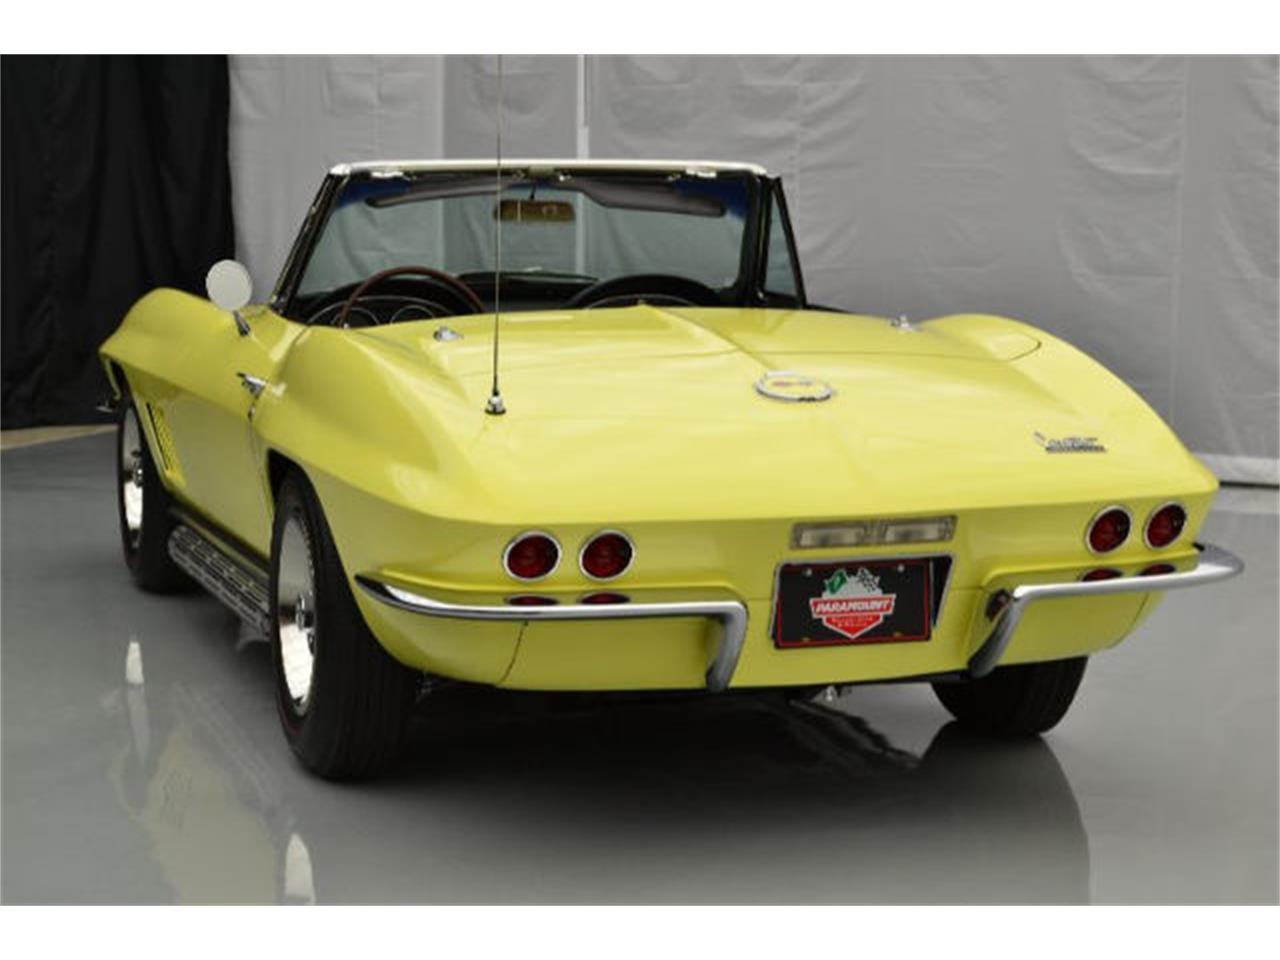 Large Picture of Classic '67 Chevrolet Corvette located in North Carolina - $139,995.00 - 8QFH